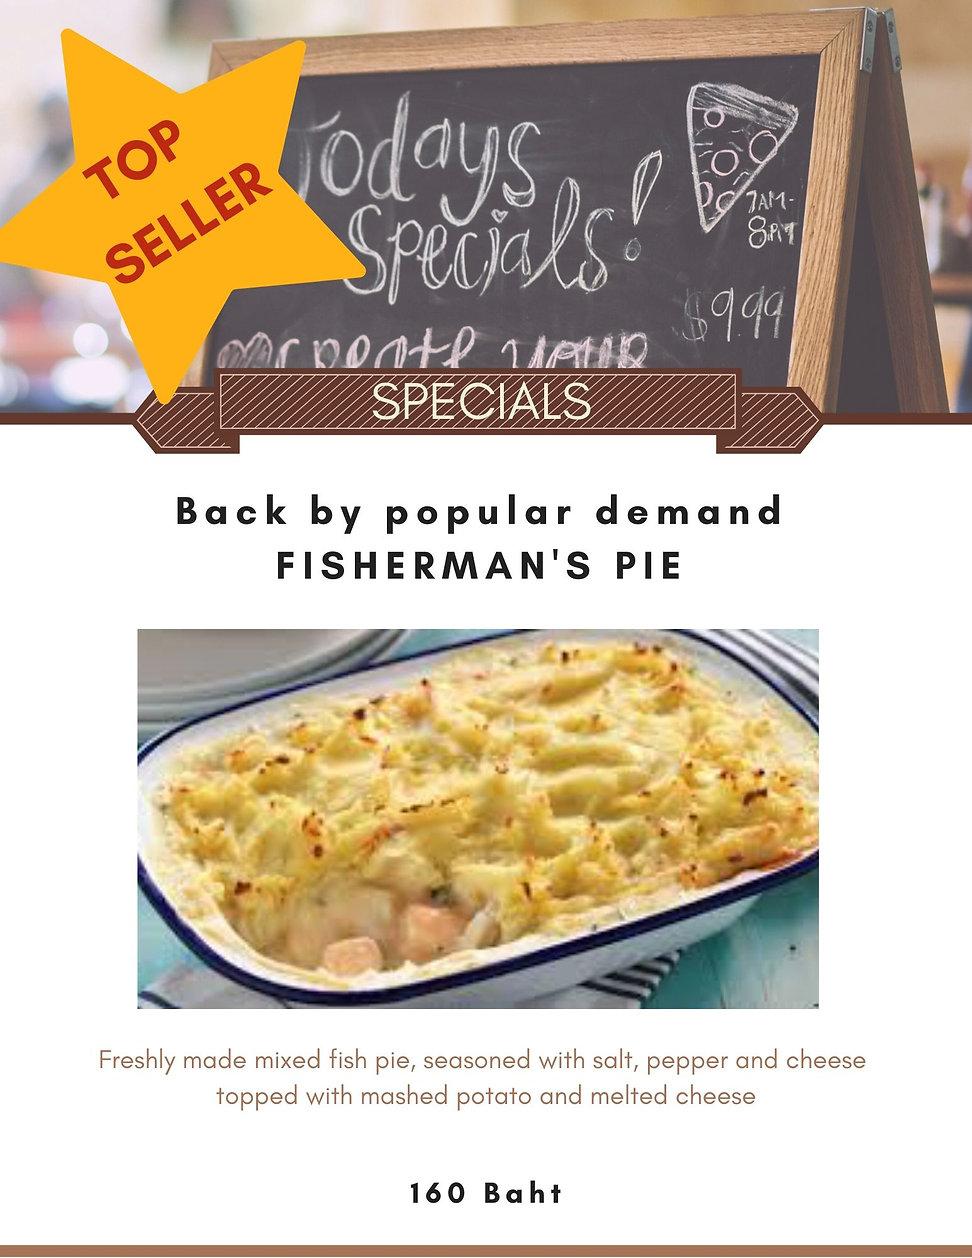 Fisherman's Pie Specials 2.jpg